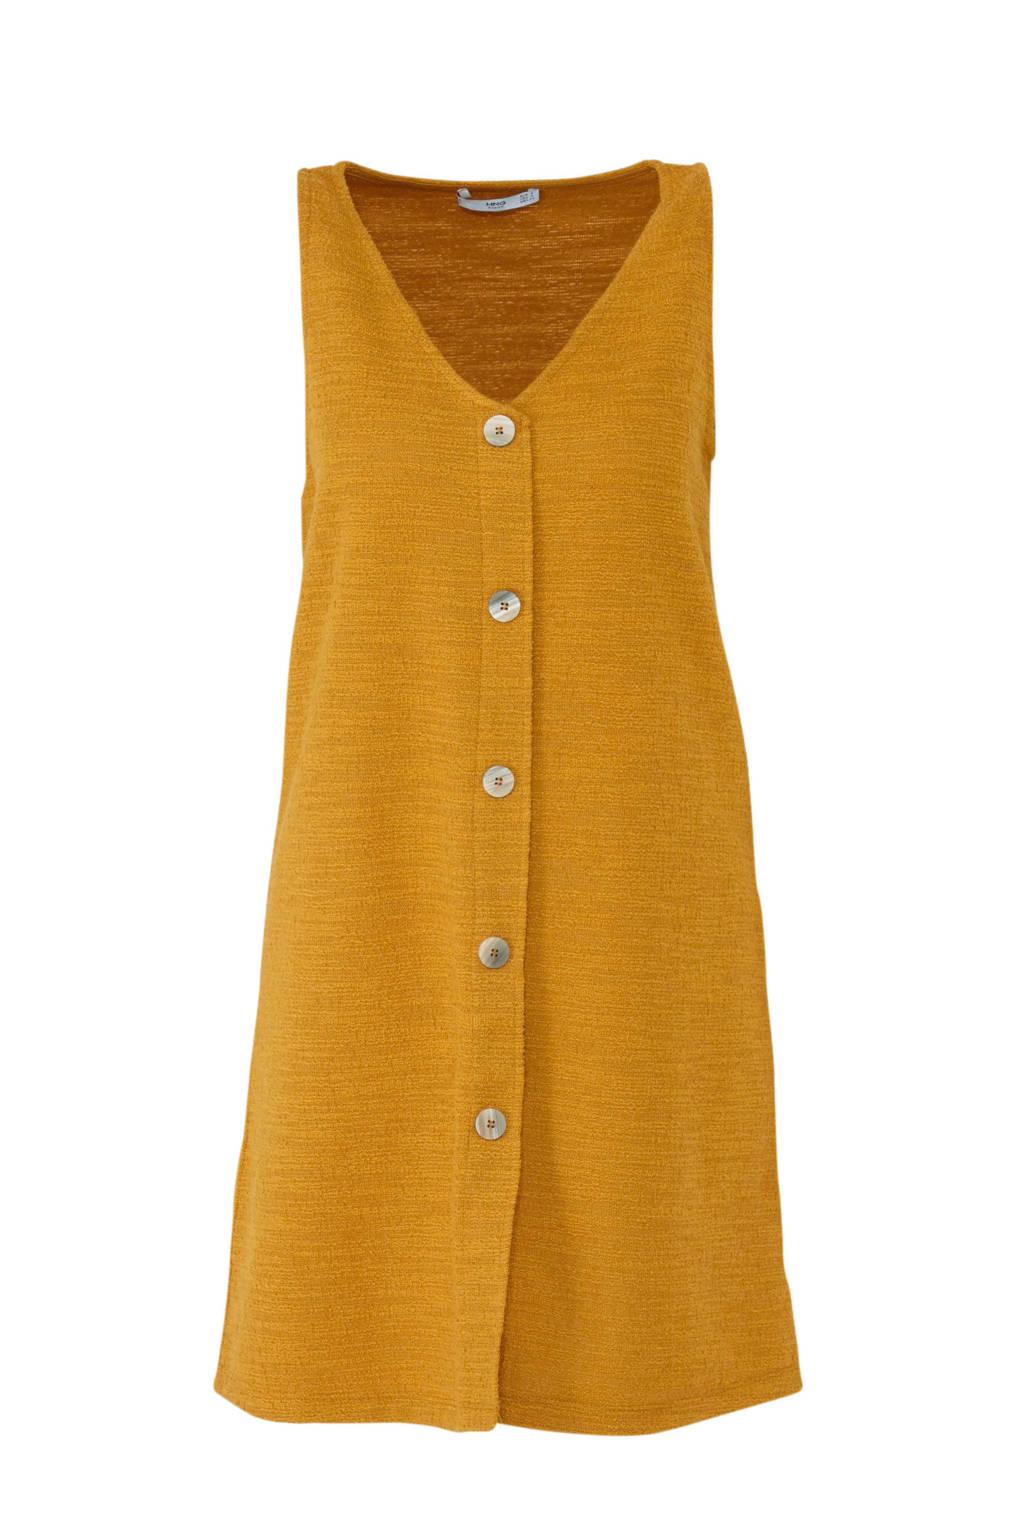 Mango jurk met textuur oker, Oker